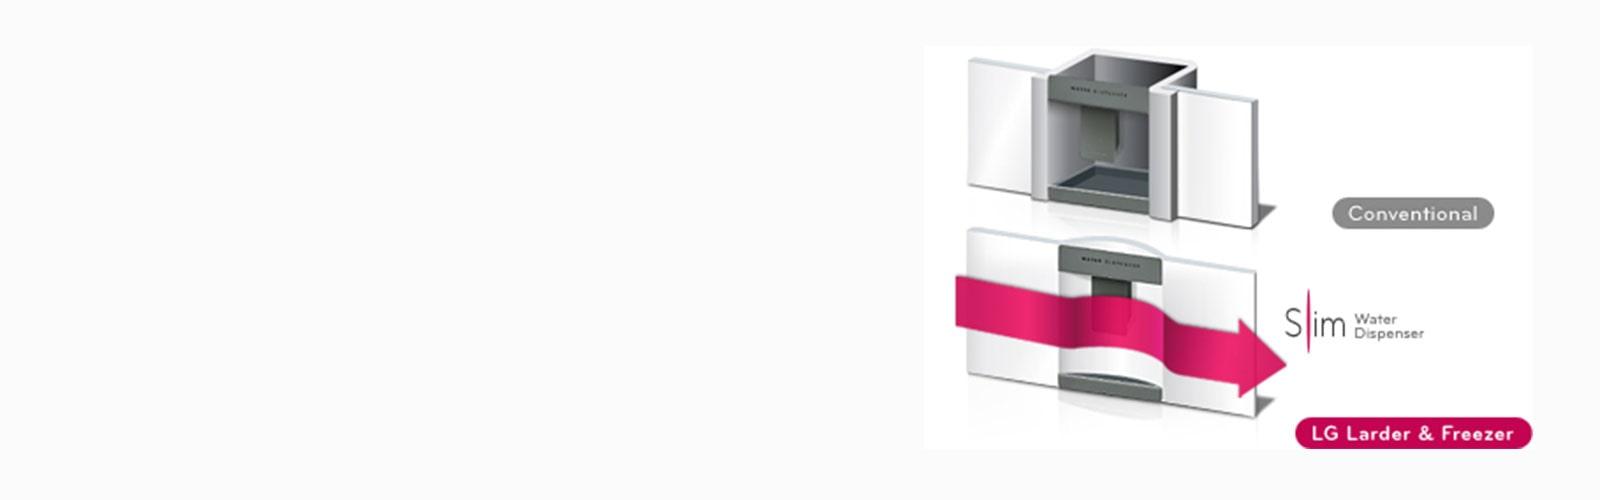 lg-refrigerator-lansen-feature_Slim_Water_Dispenser_D